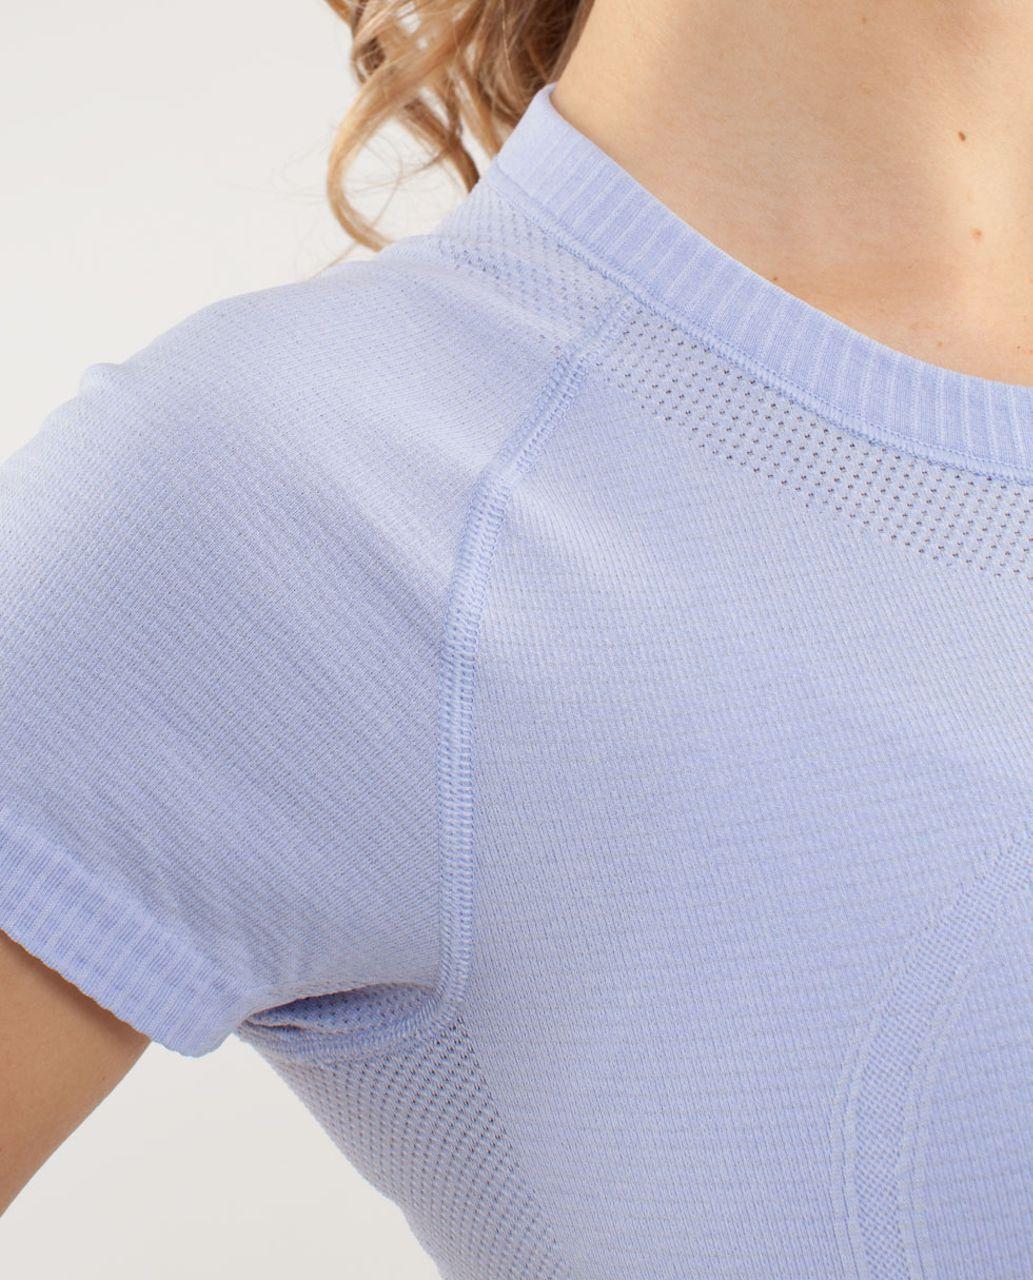 Lululemon Run:  Swiftly Tech Short Sleeve - Lavender Dusk